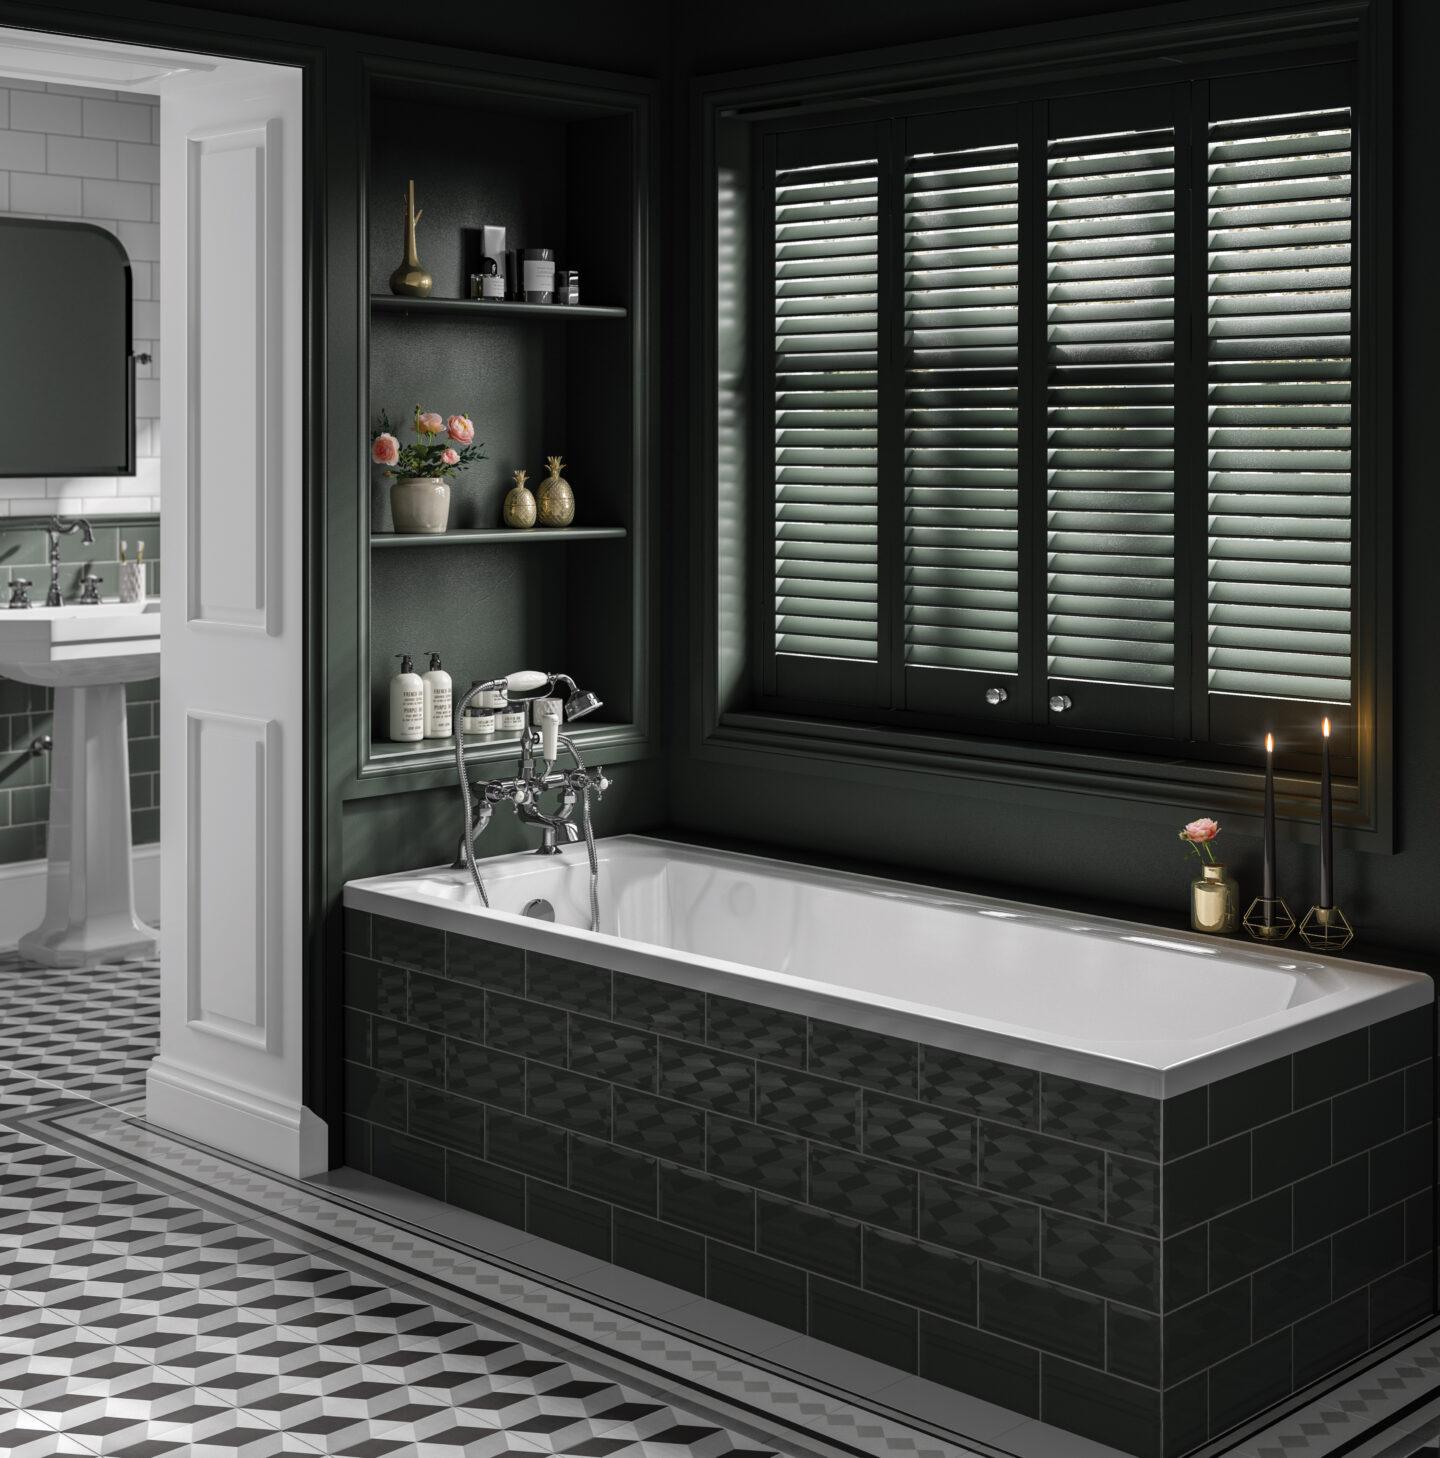 Trojan's Art Deco Single Ended Bath